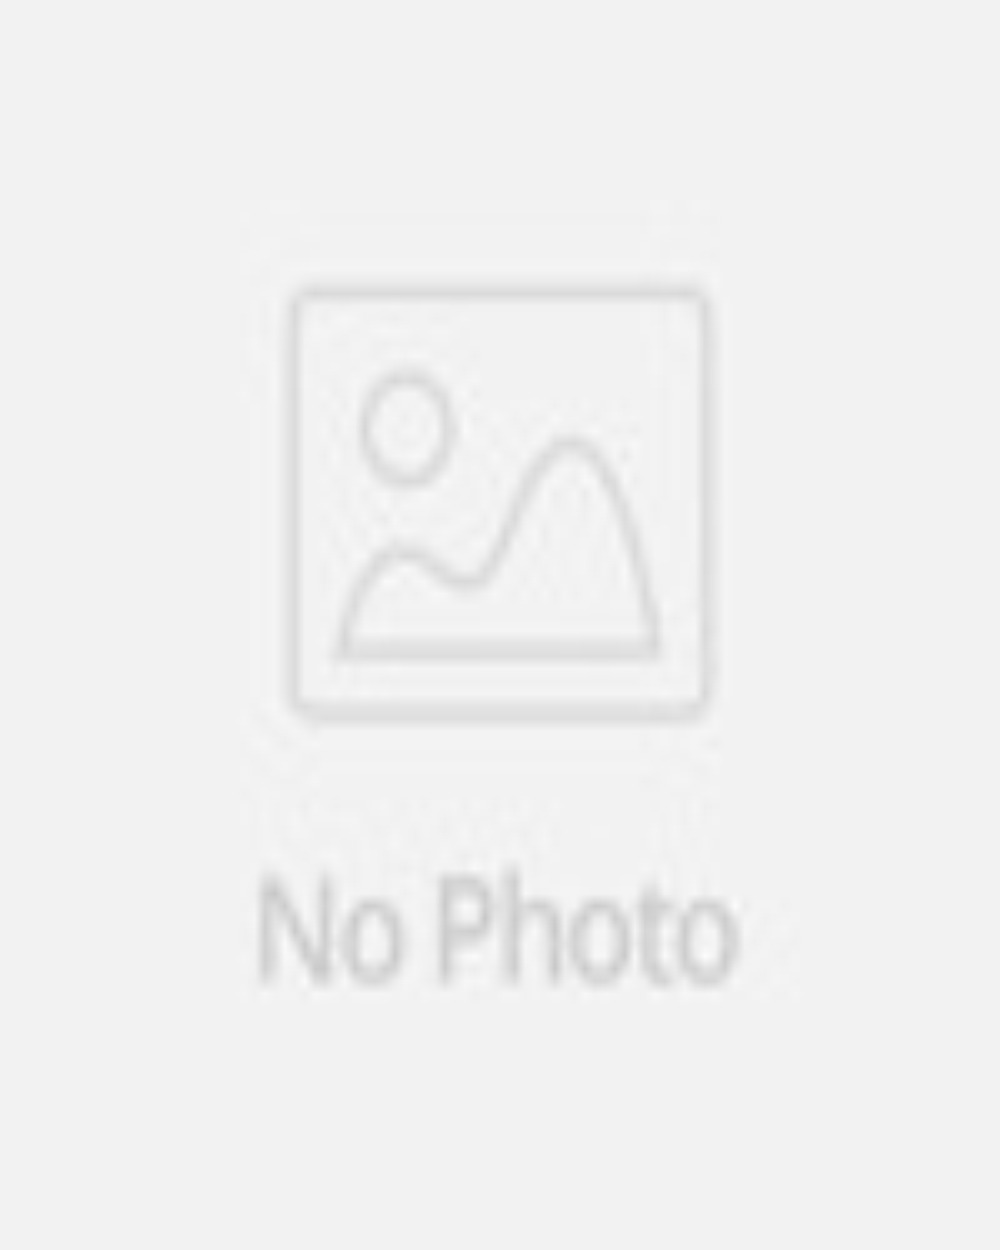 2015 Sexy Hochzeitskleider Ball Gown Decoration Crystal Chapel Train ...